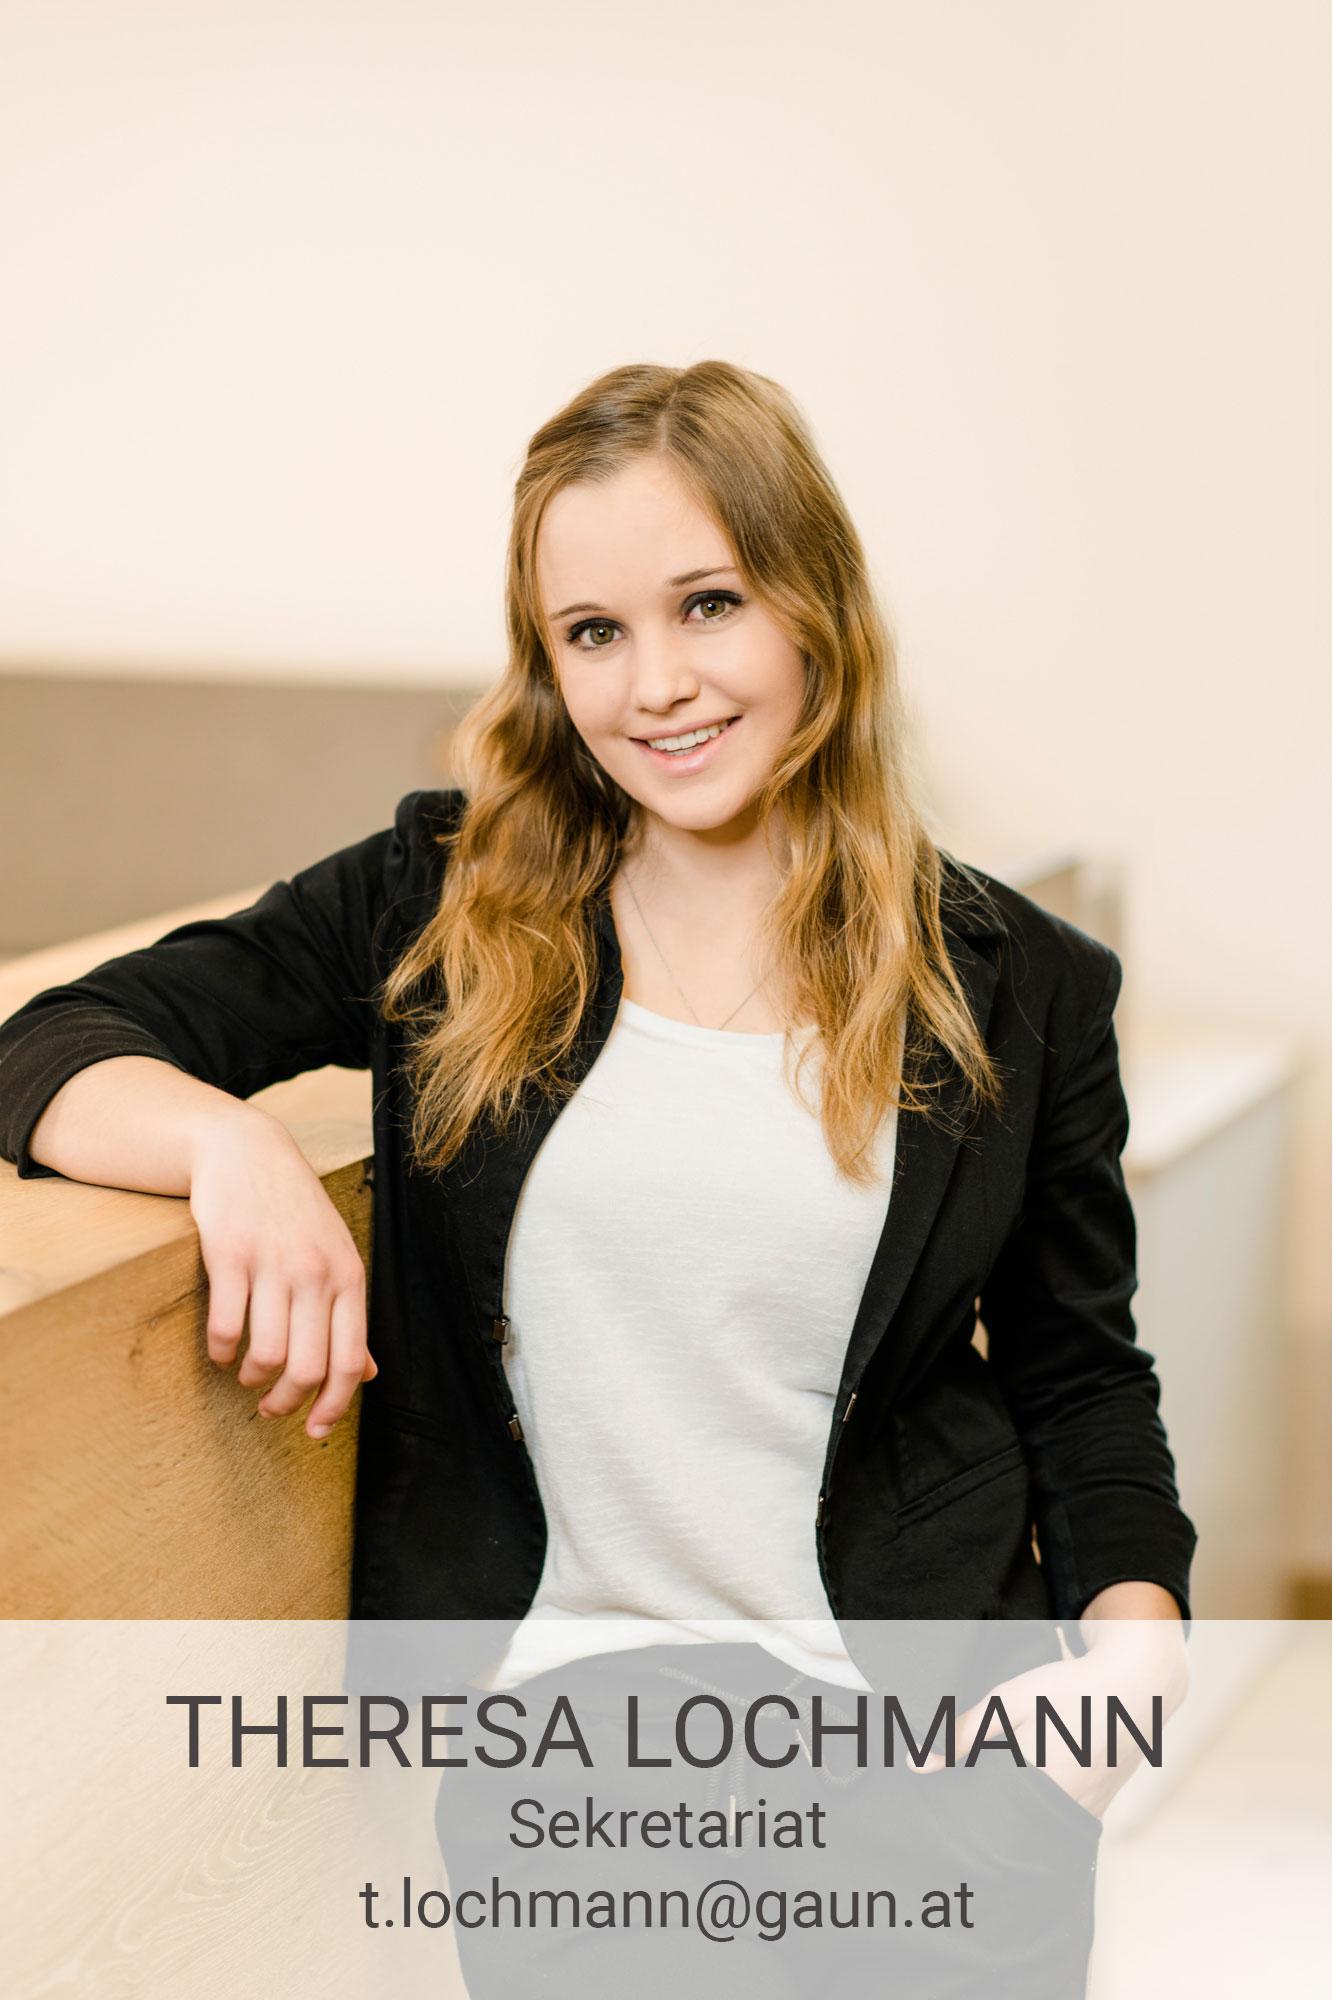 Theresa Lochmann